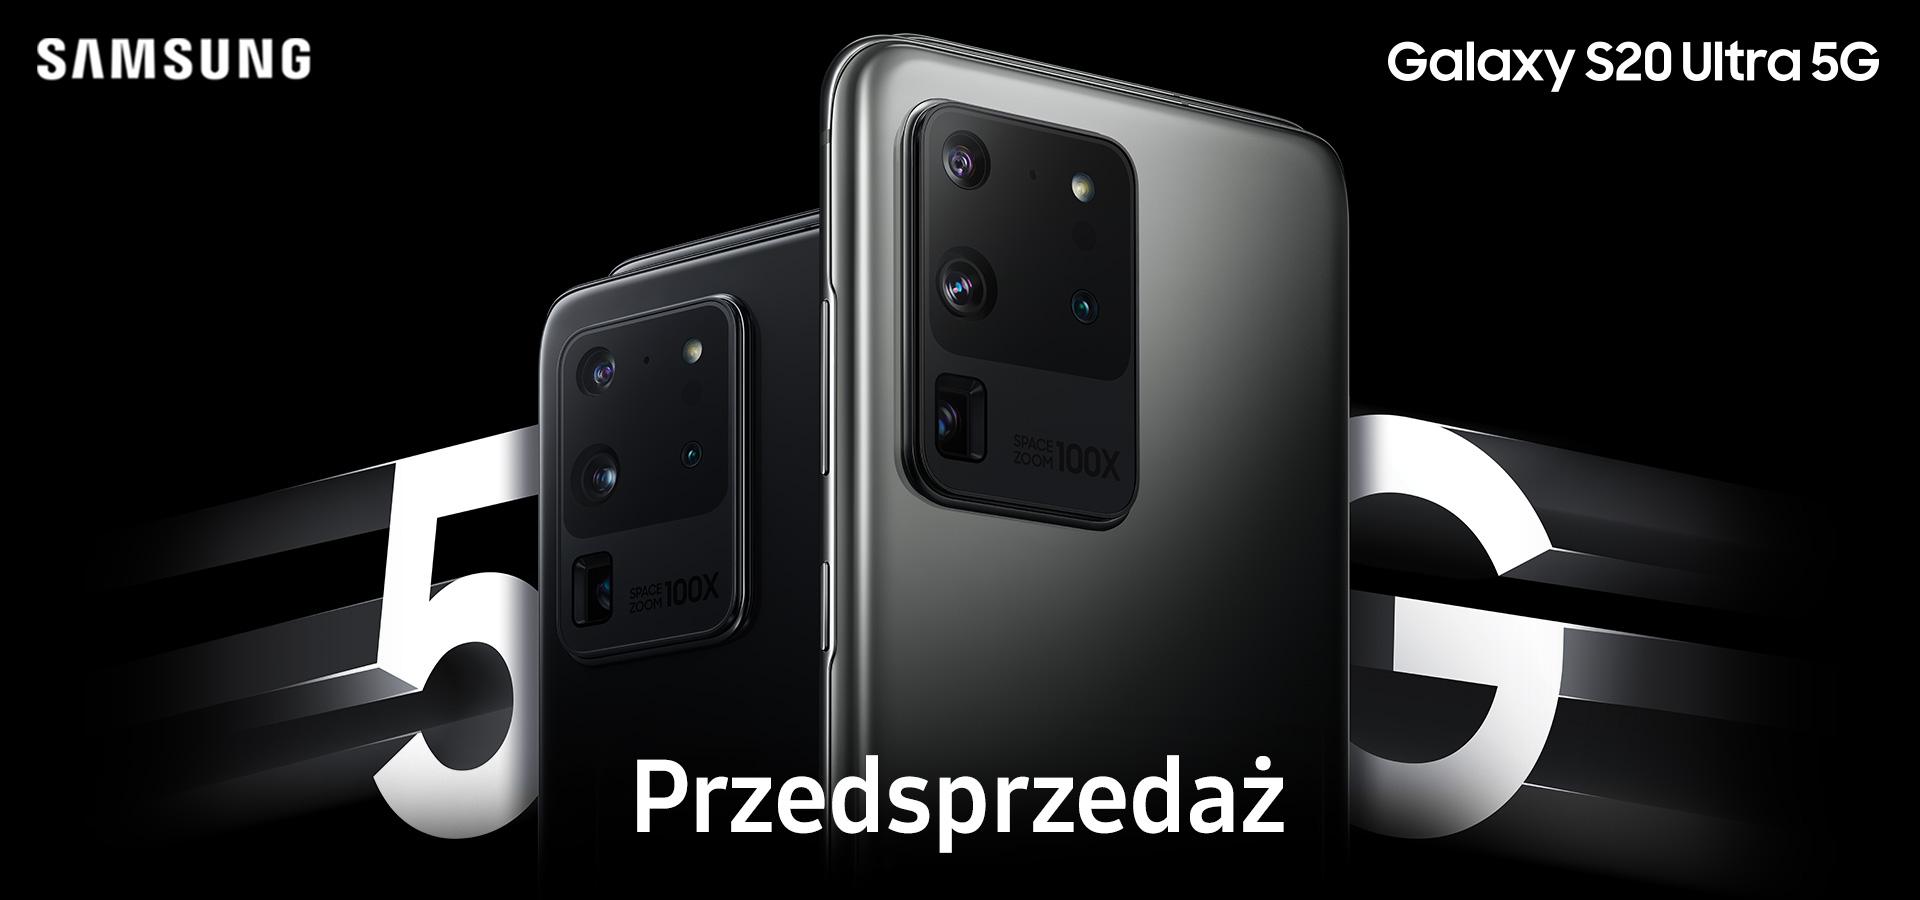 Samsung Galaxy S20 Ultra 5G Kv 1920px